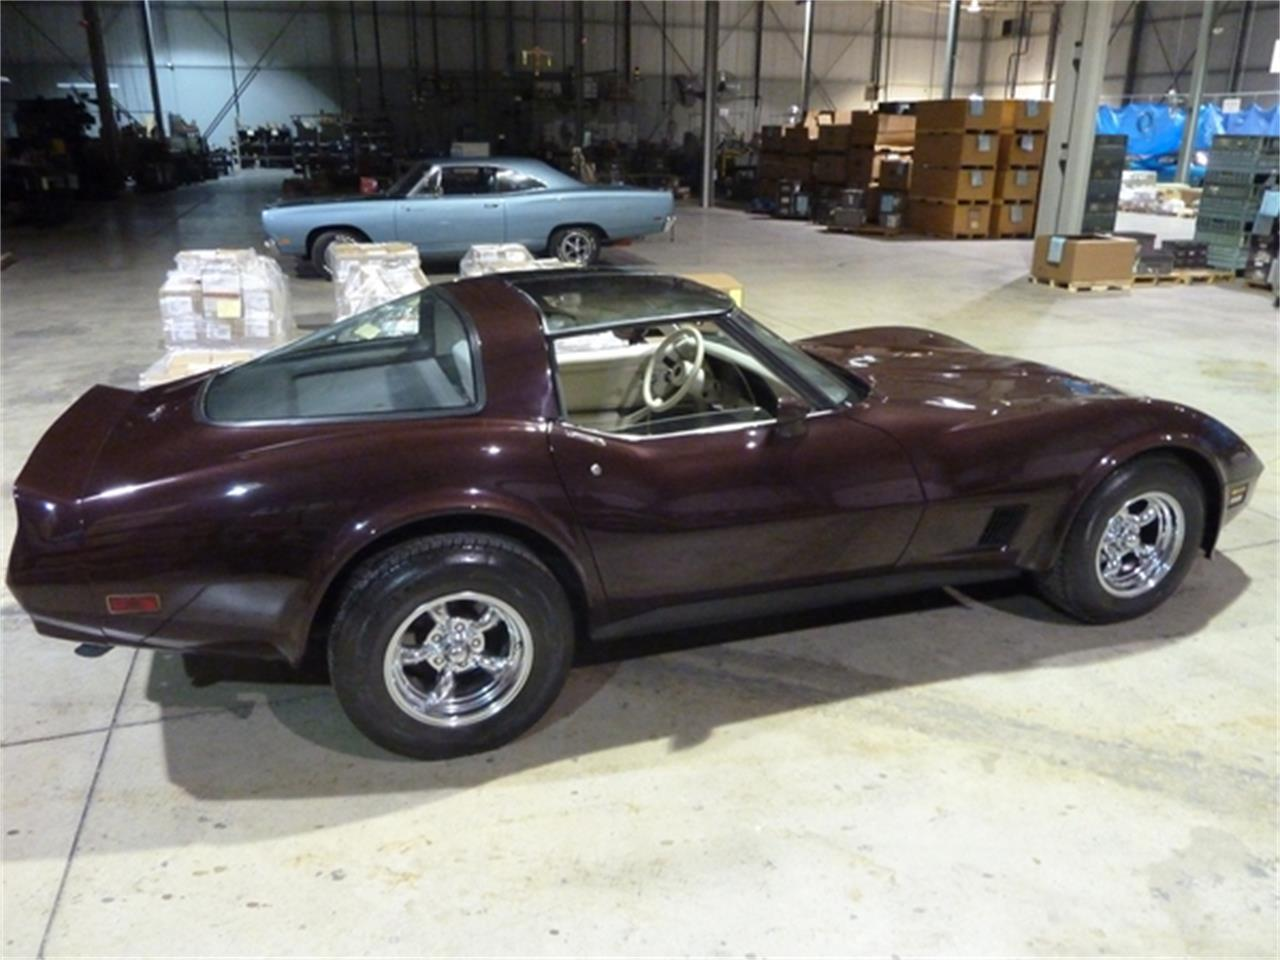 Large Picture of '80 Chevrolet Corvette - $19,900.00 - J312